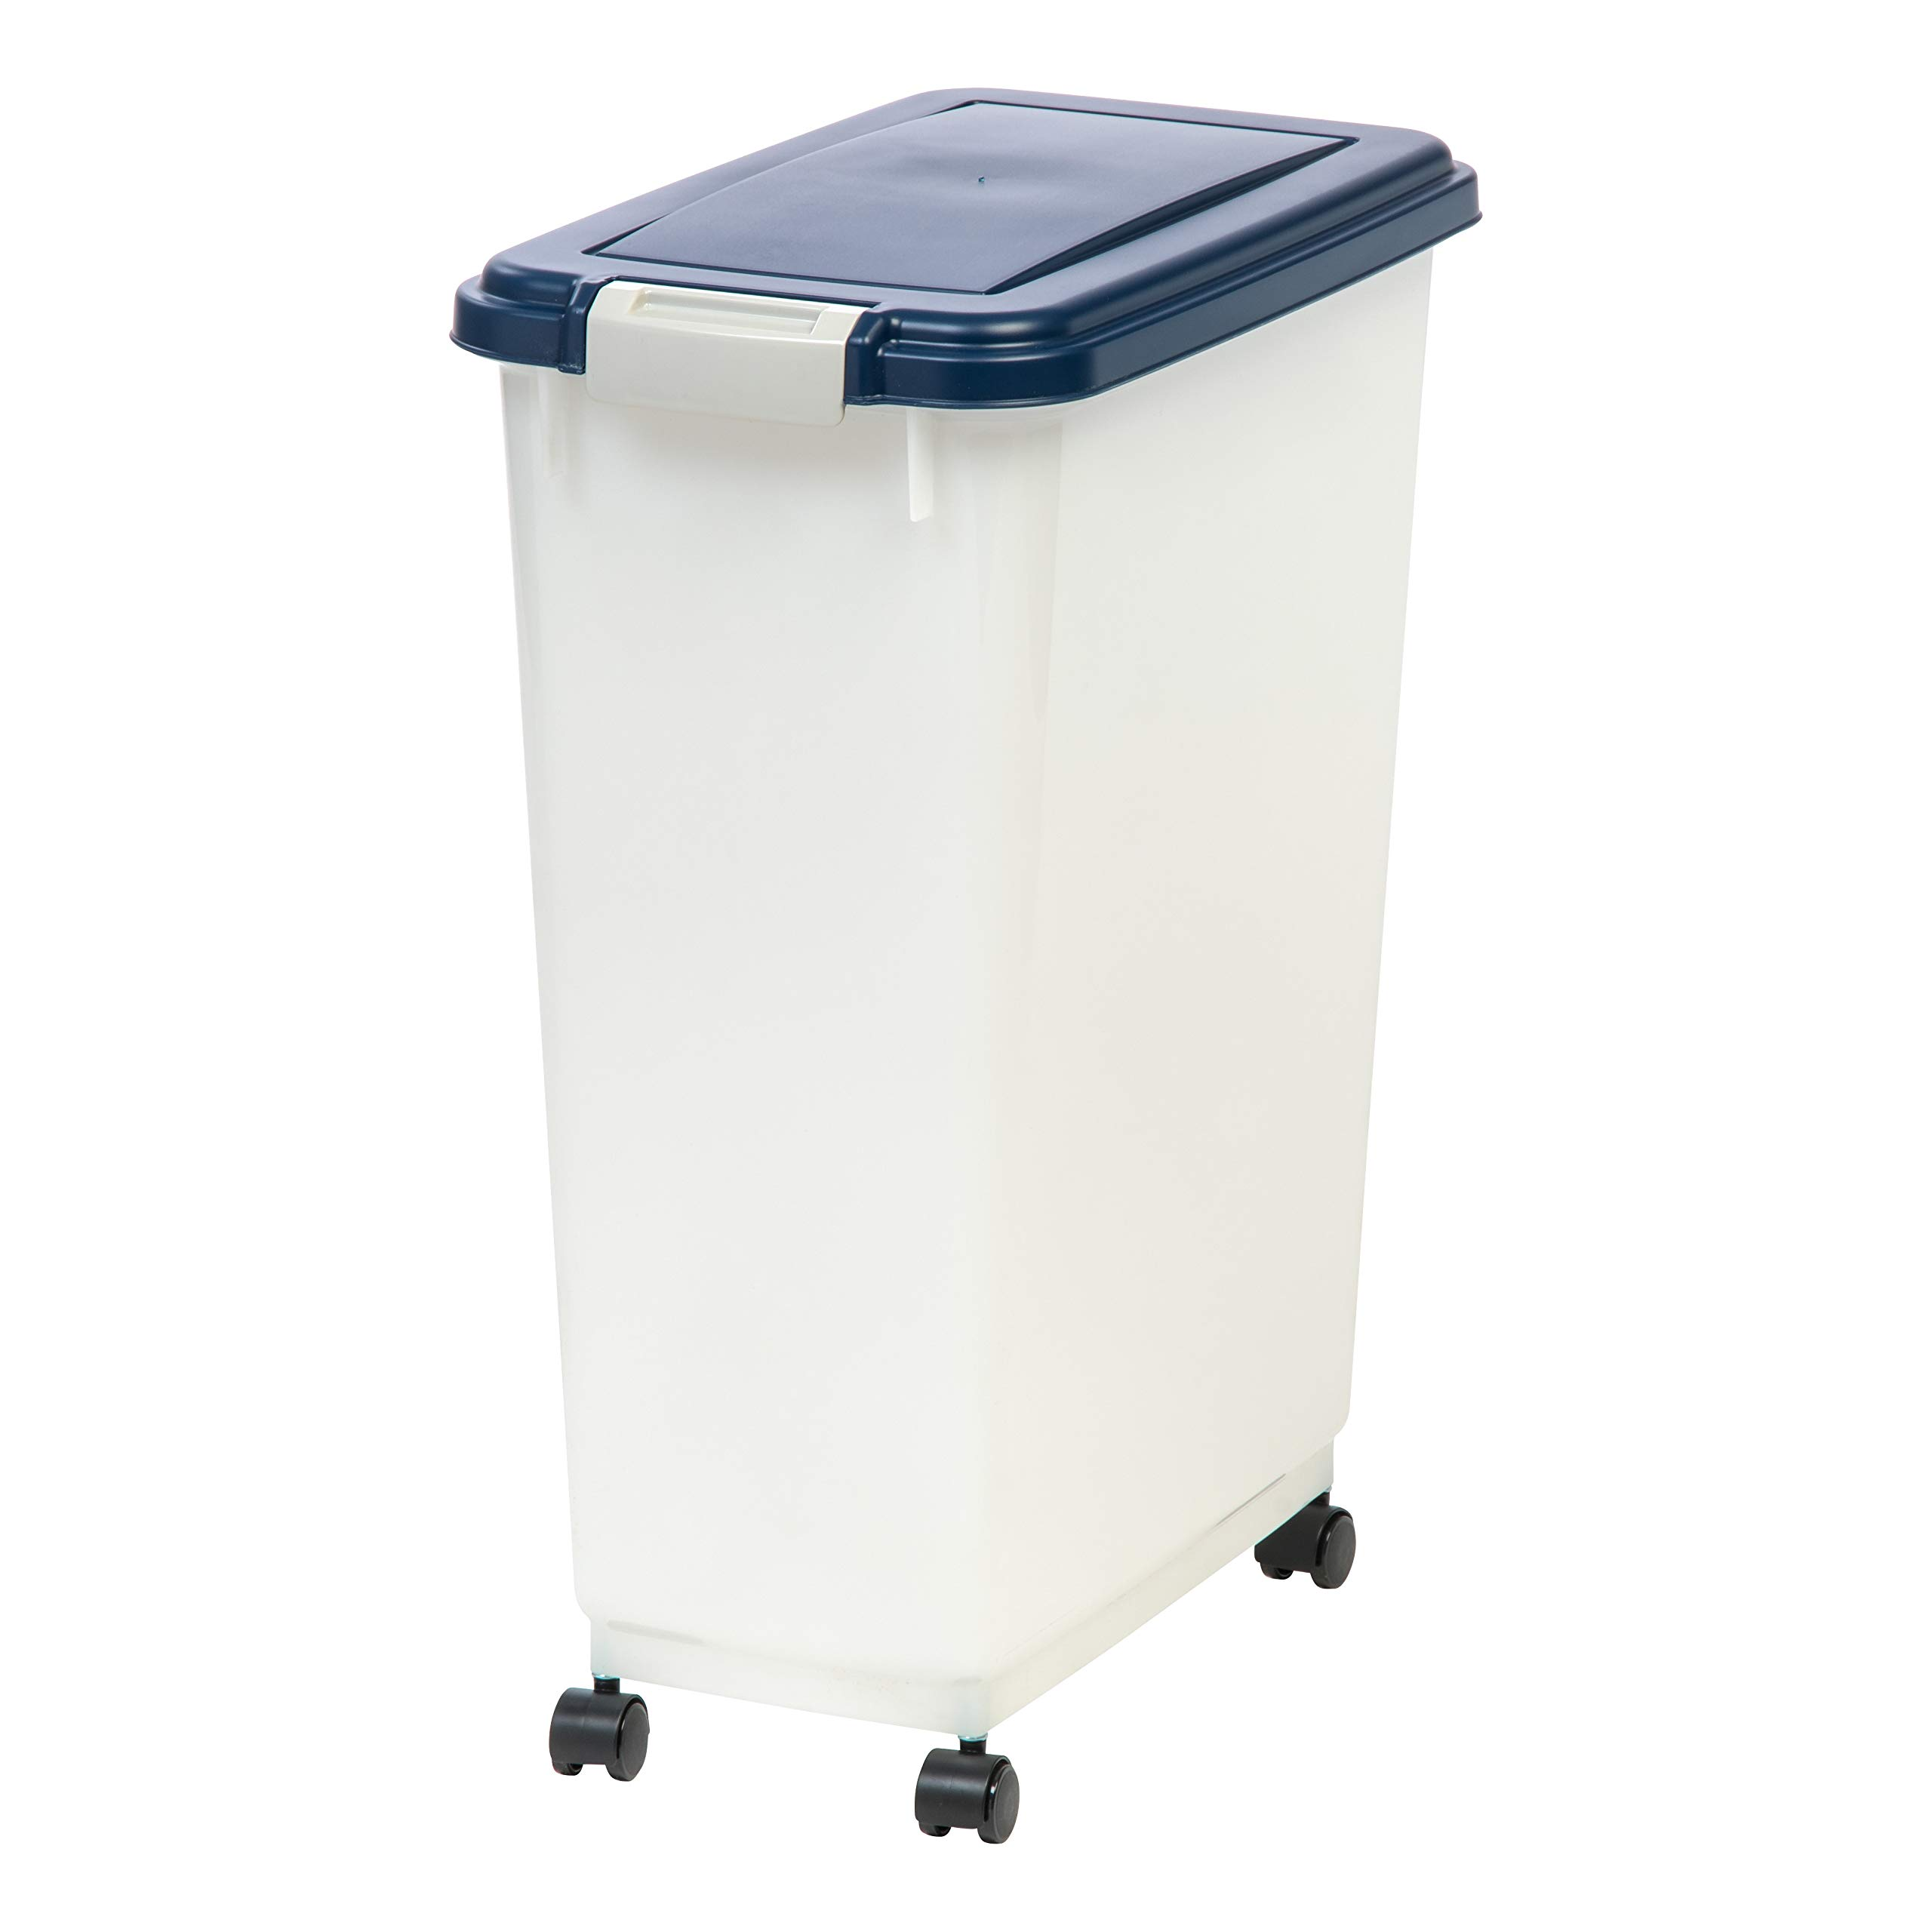 IRIS 47 Quart Airtight Pet Food Container, Navy